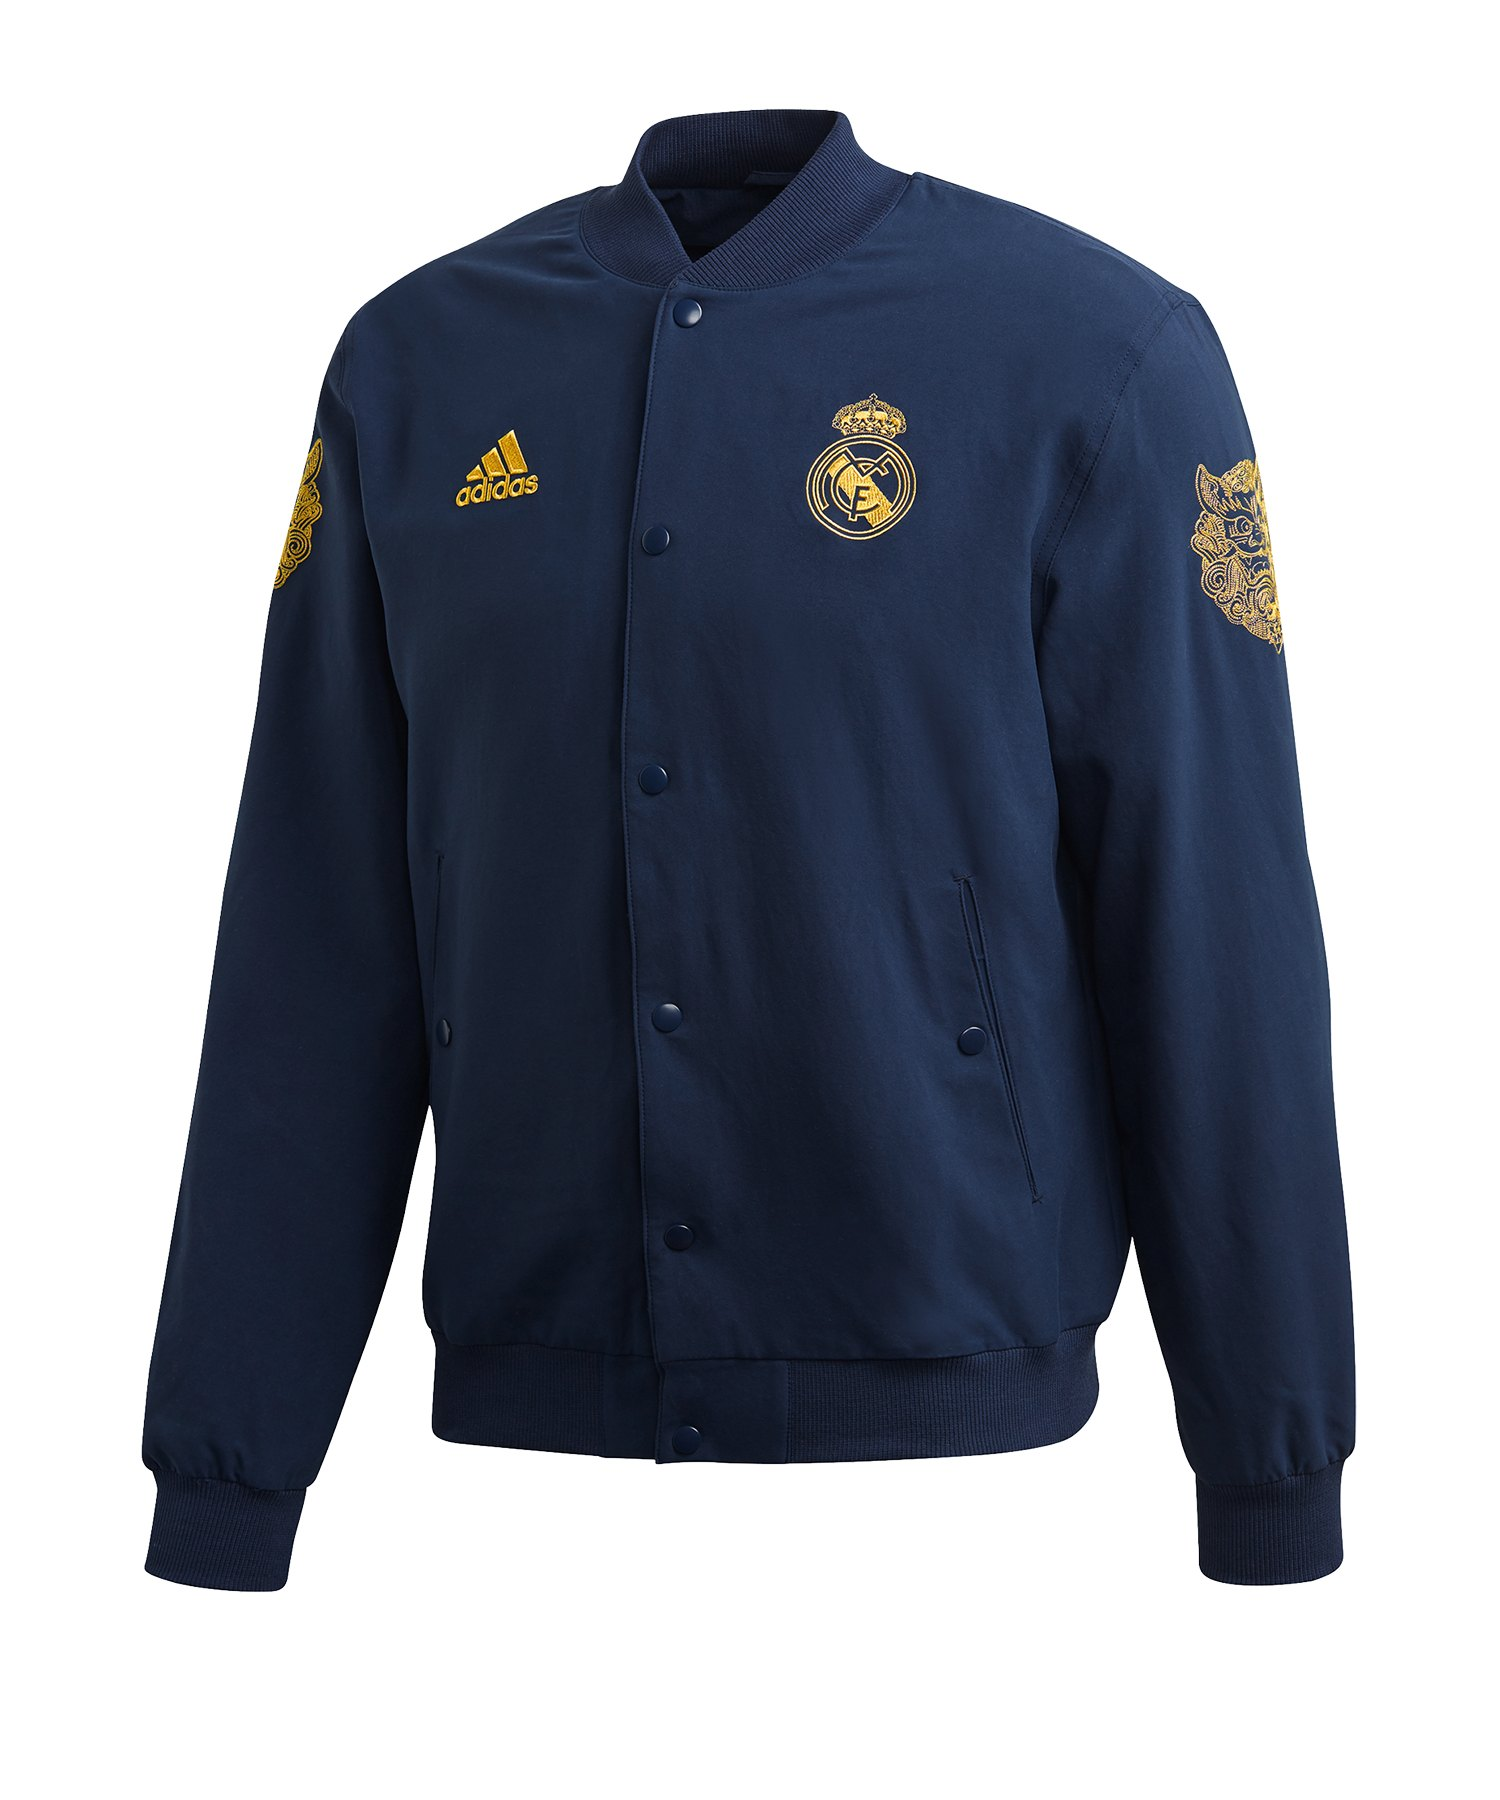 adidas Real Madrid CNY Jacke Blau - blau